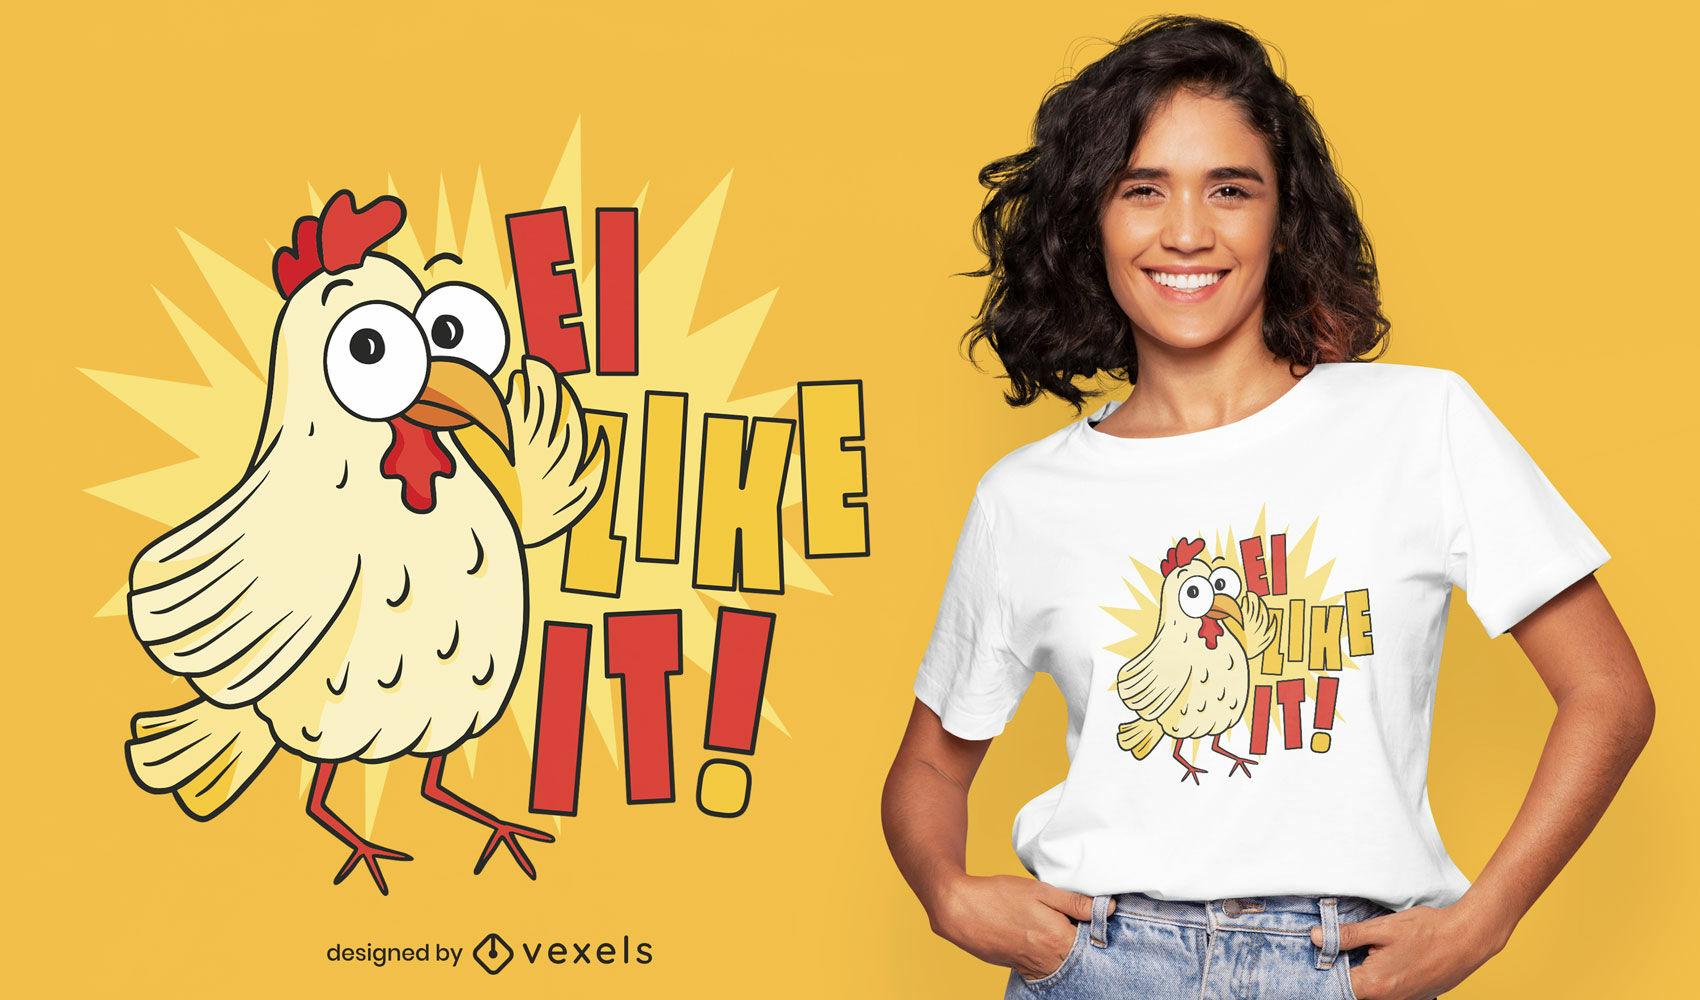 Chicken like it t-shirt design